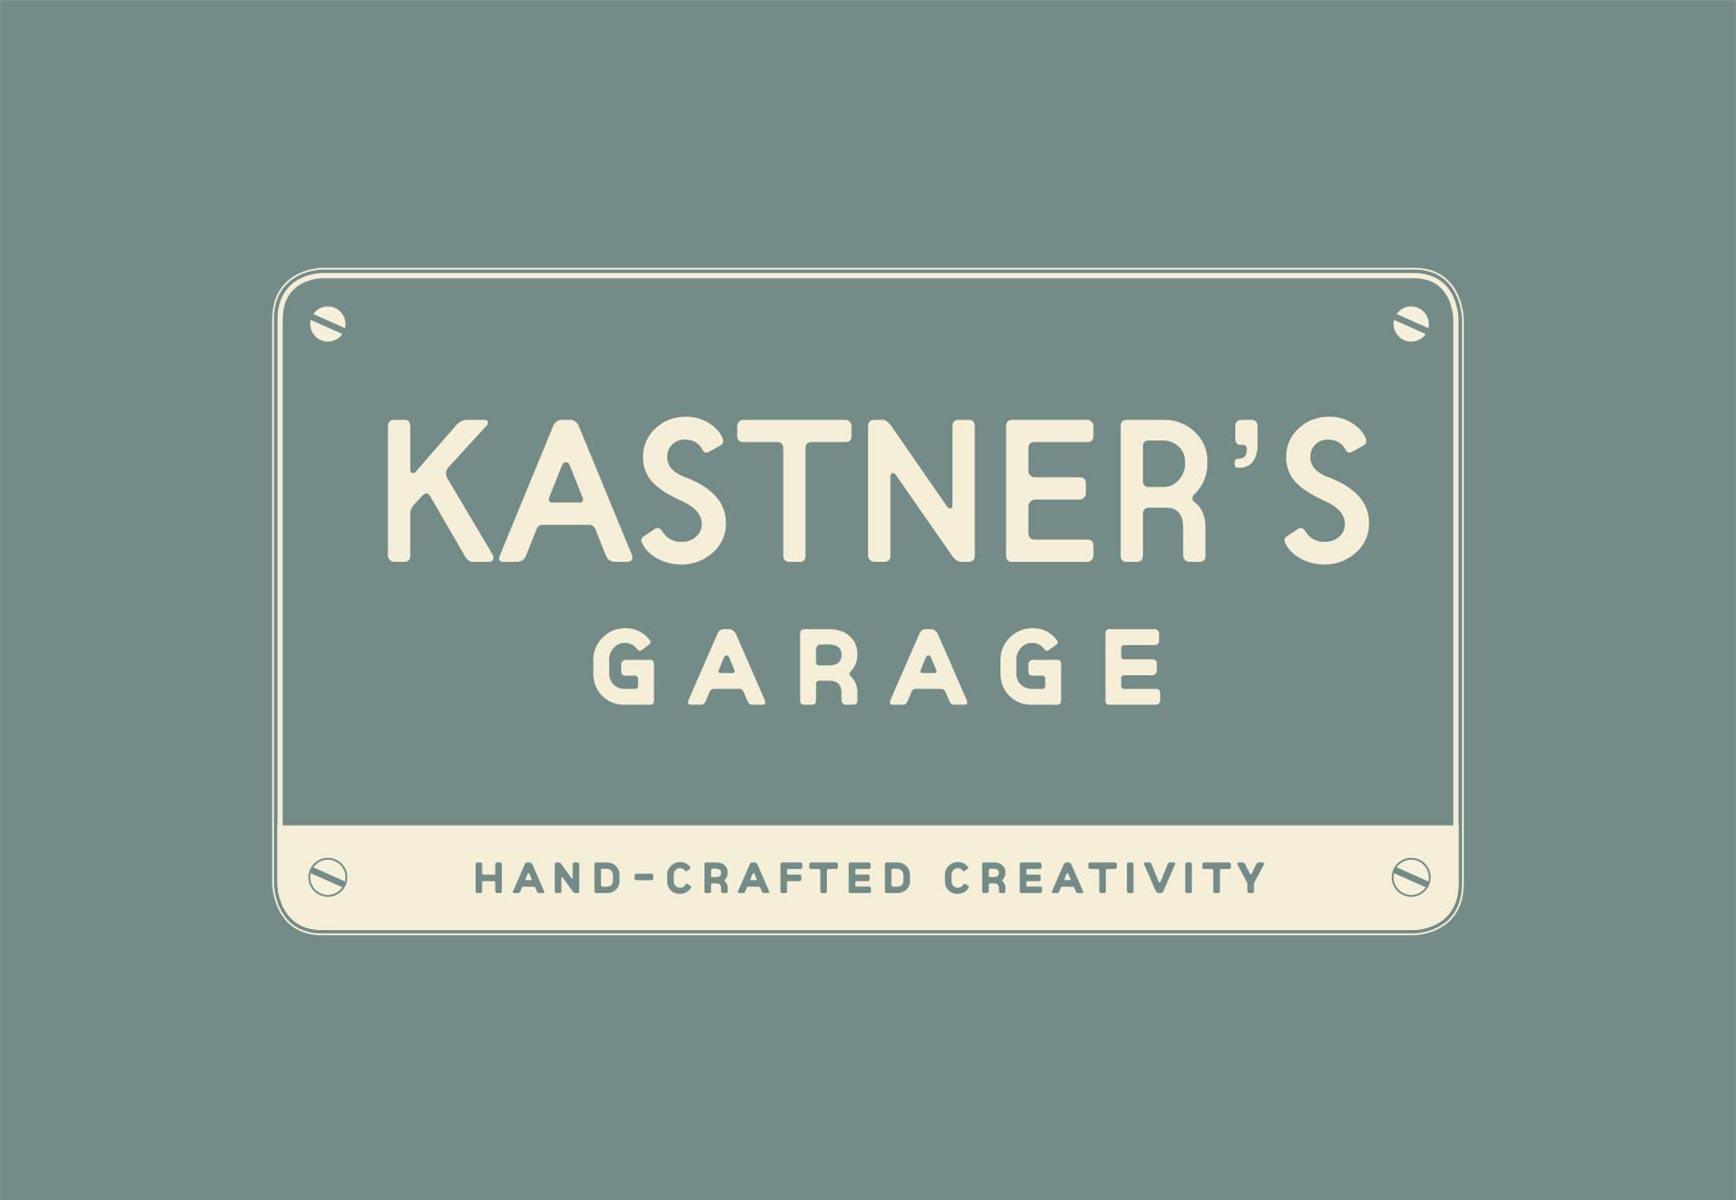 Kastner's Garage | Corporate Identity